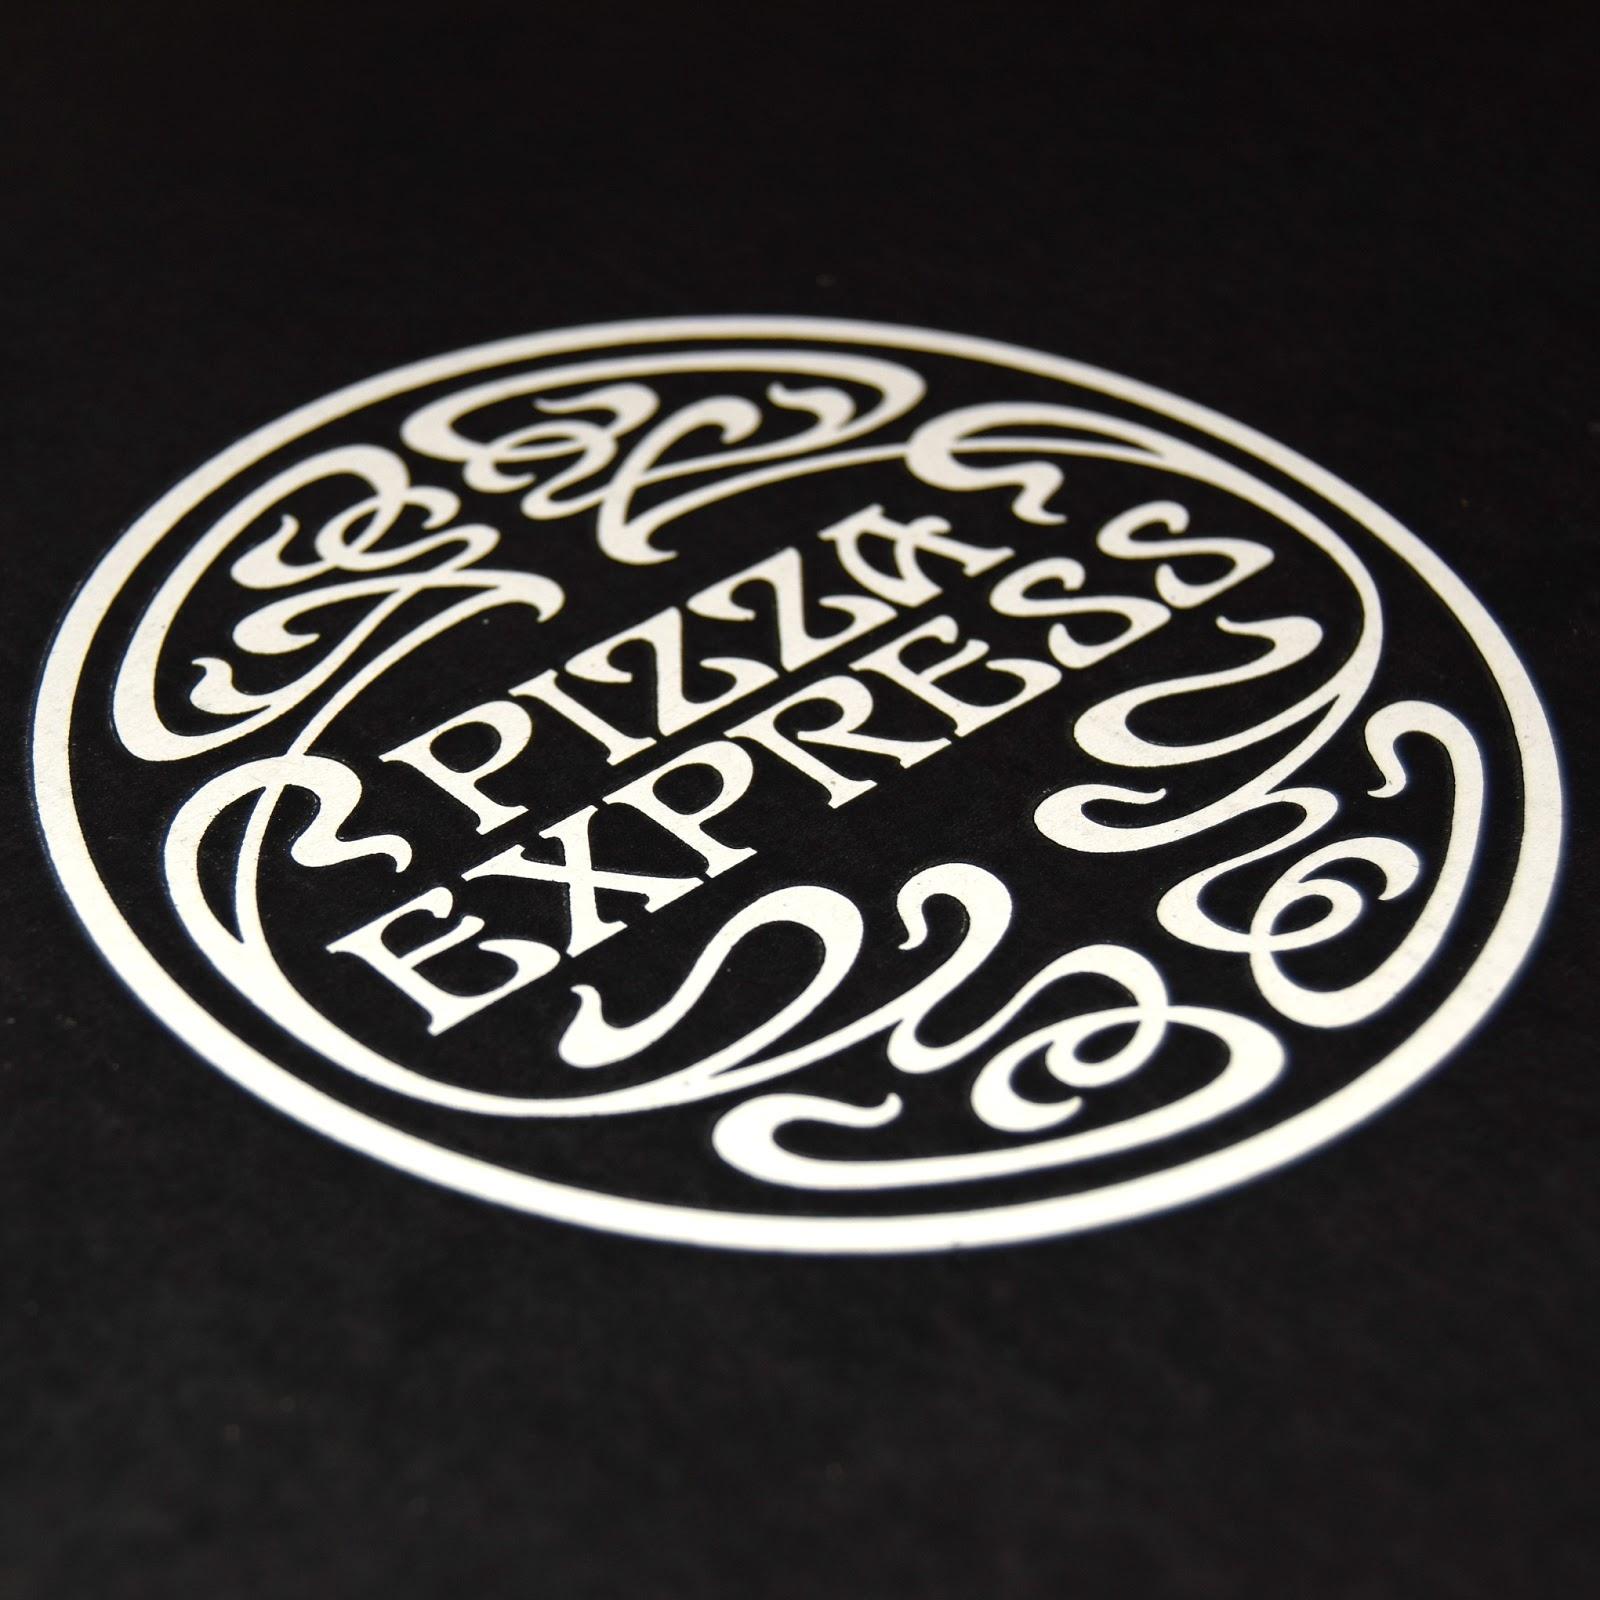 Wafflemama Pizza Night Pizza Express Etna Via Deliveroo